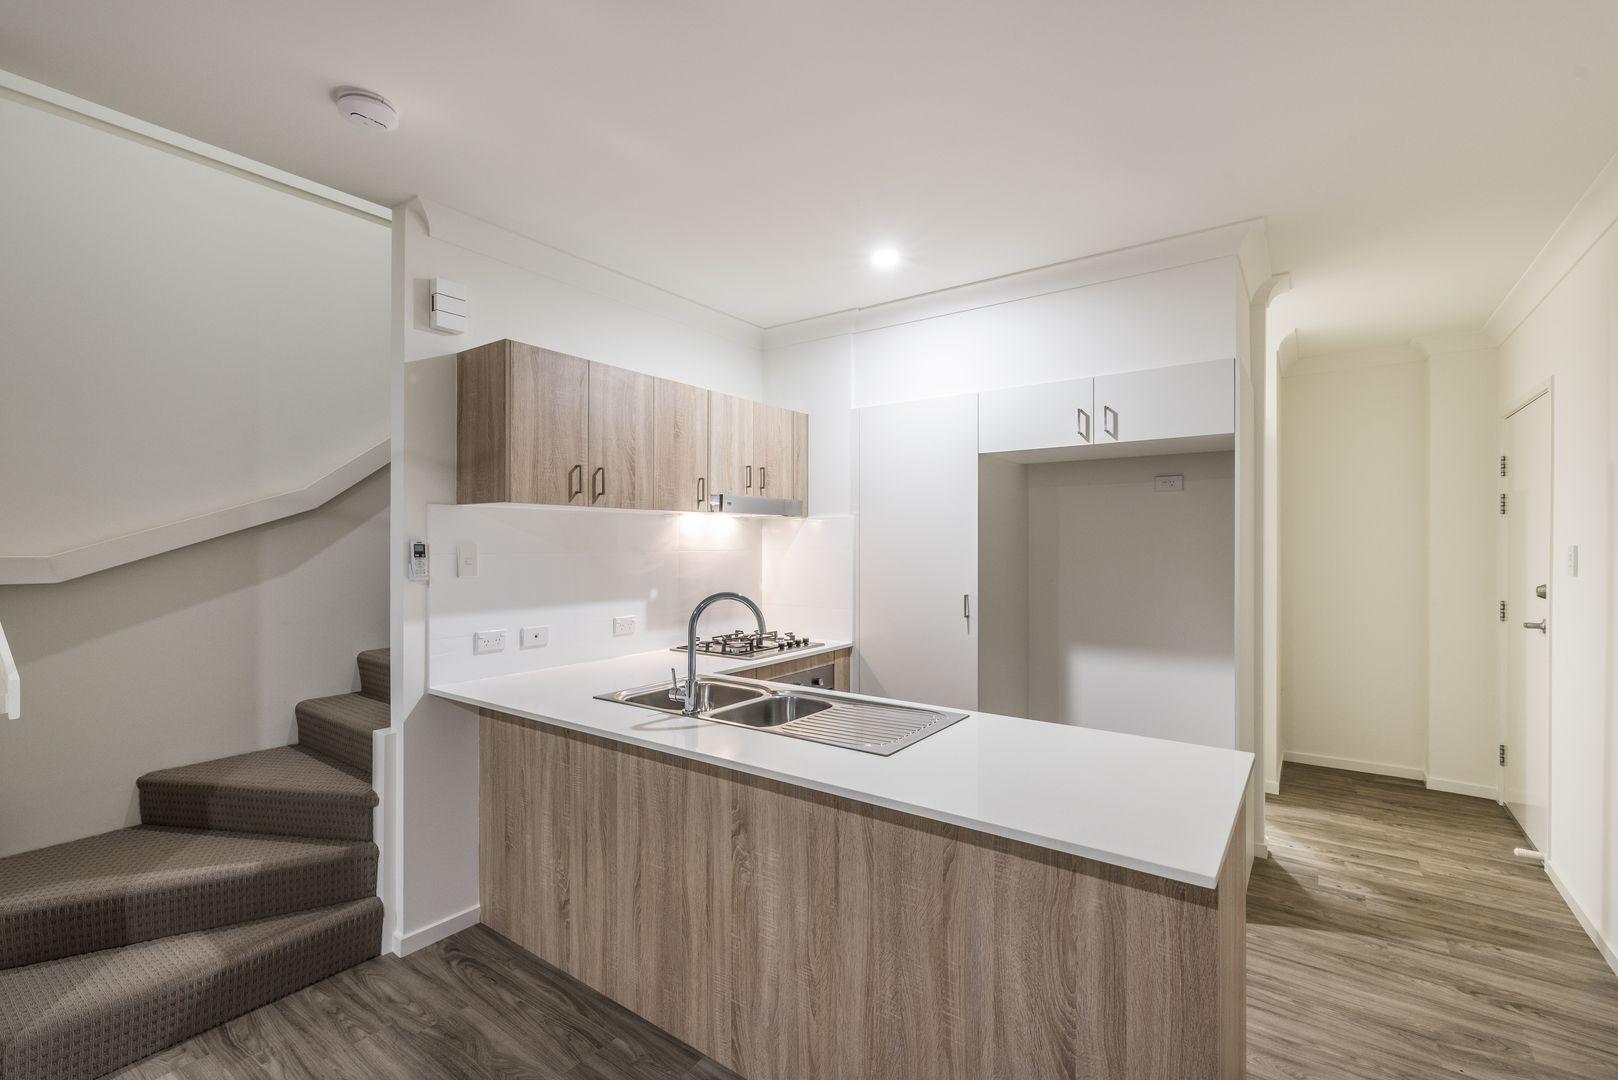 36/7 Giosam Street, Richlands QLD 4077, Image 1